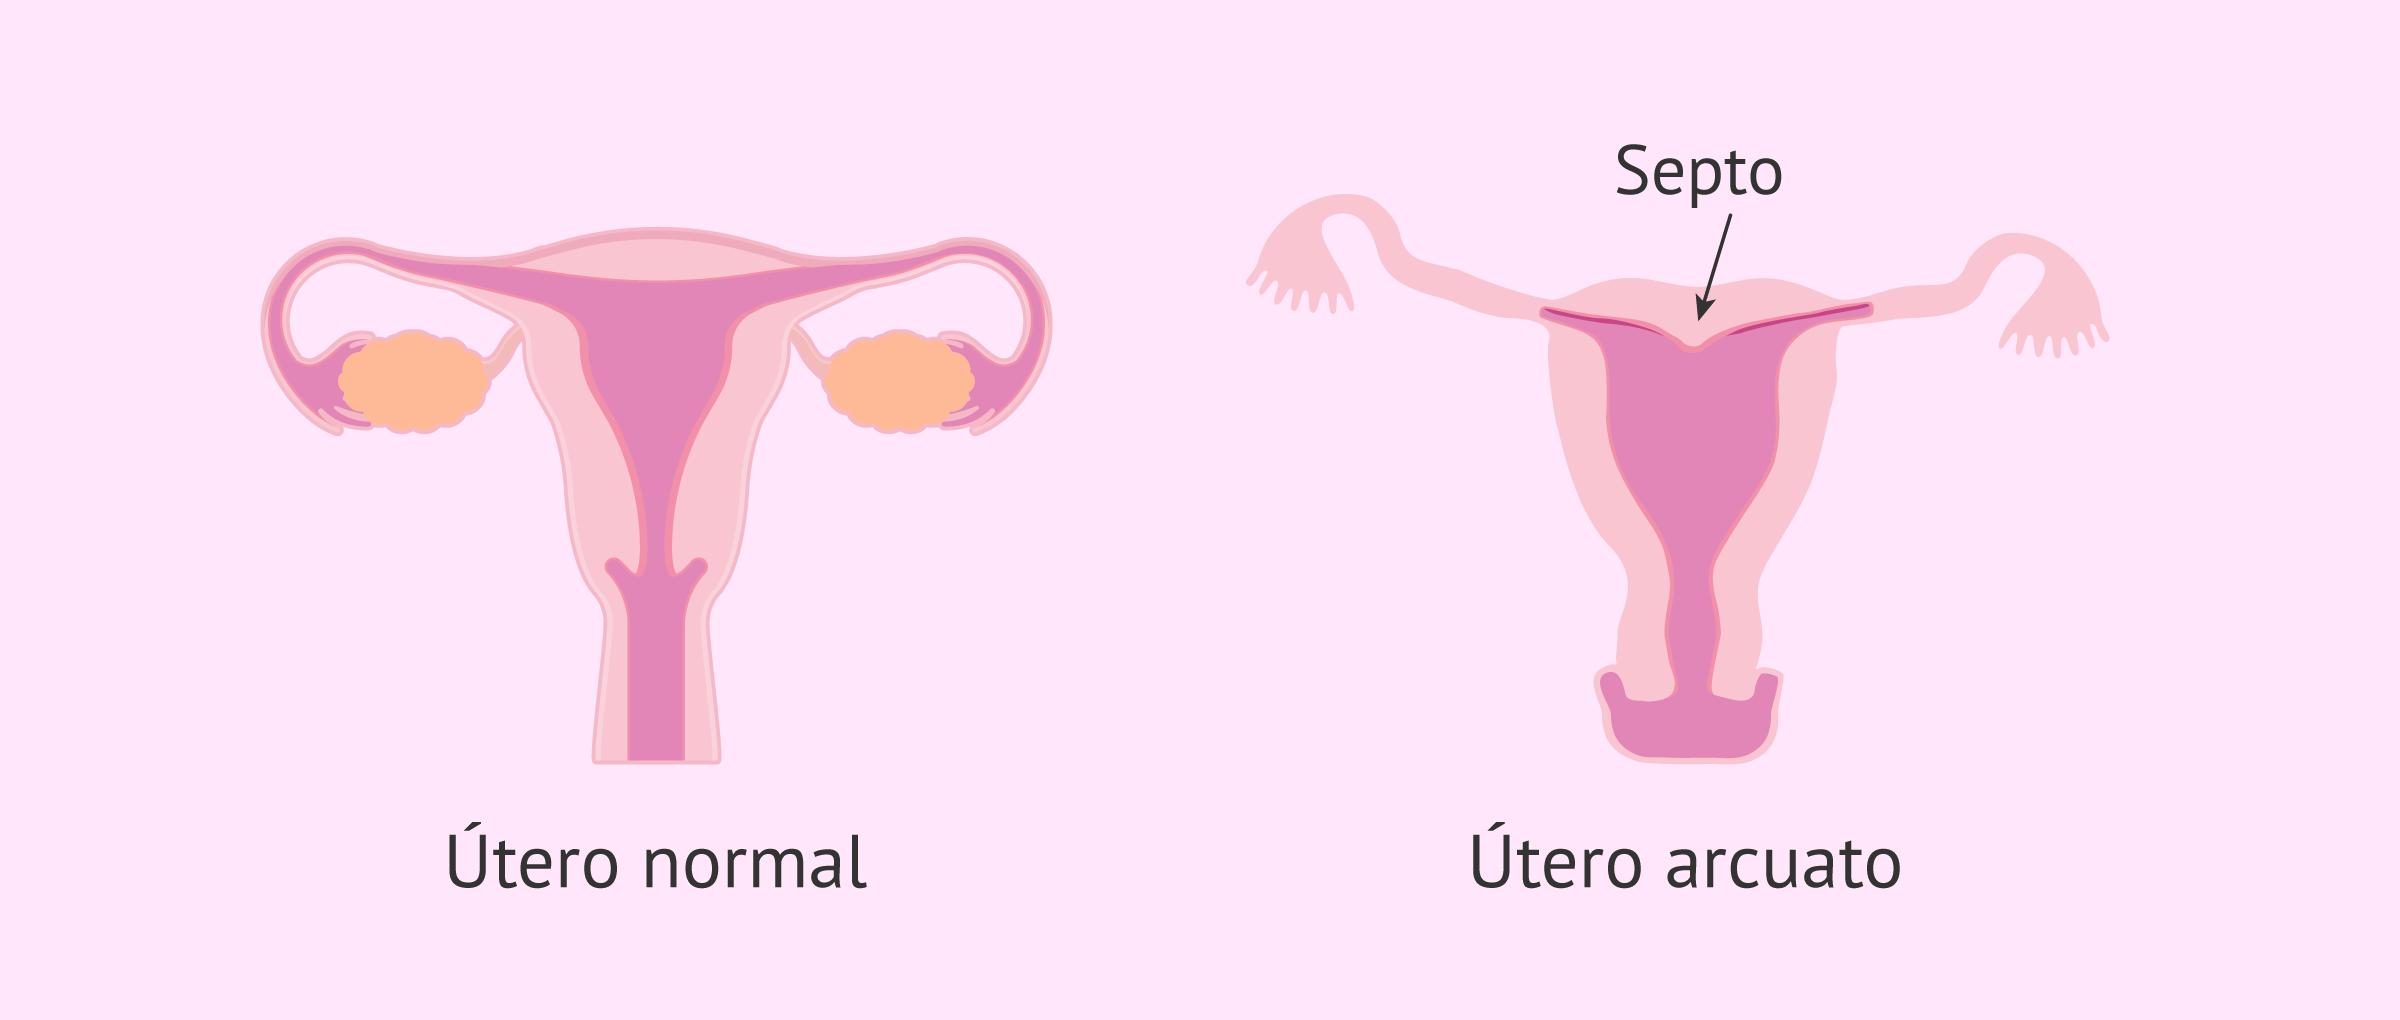 utero-arcuato-glosario